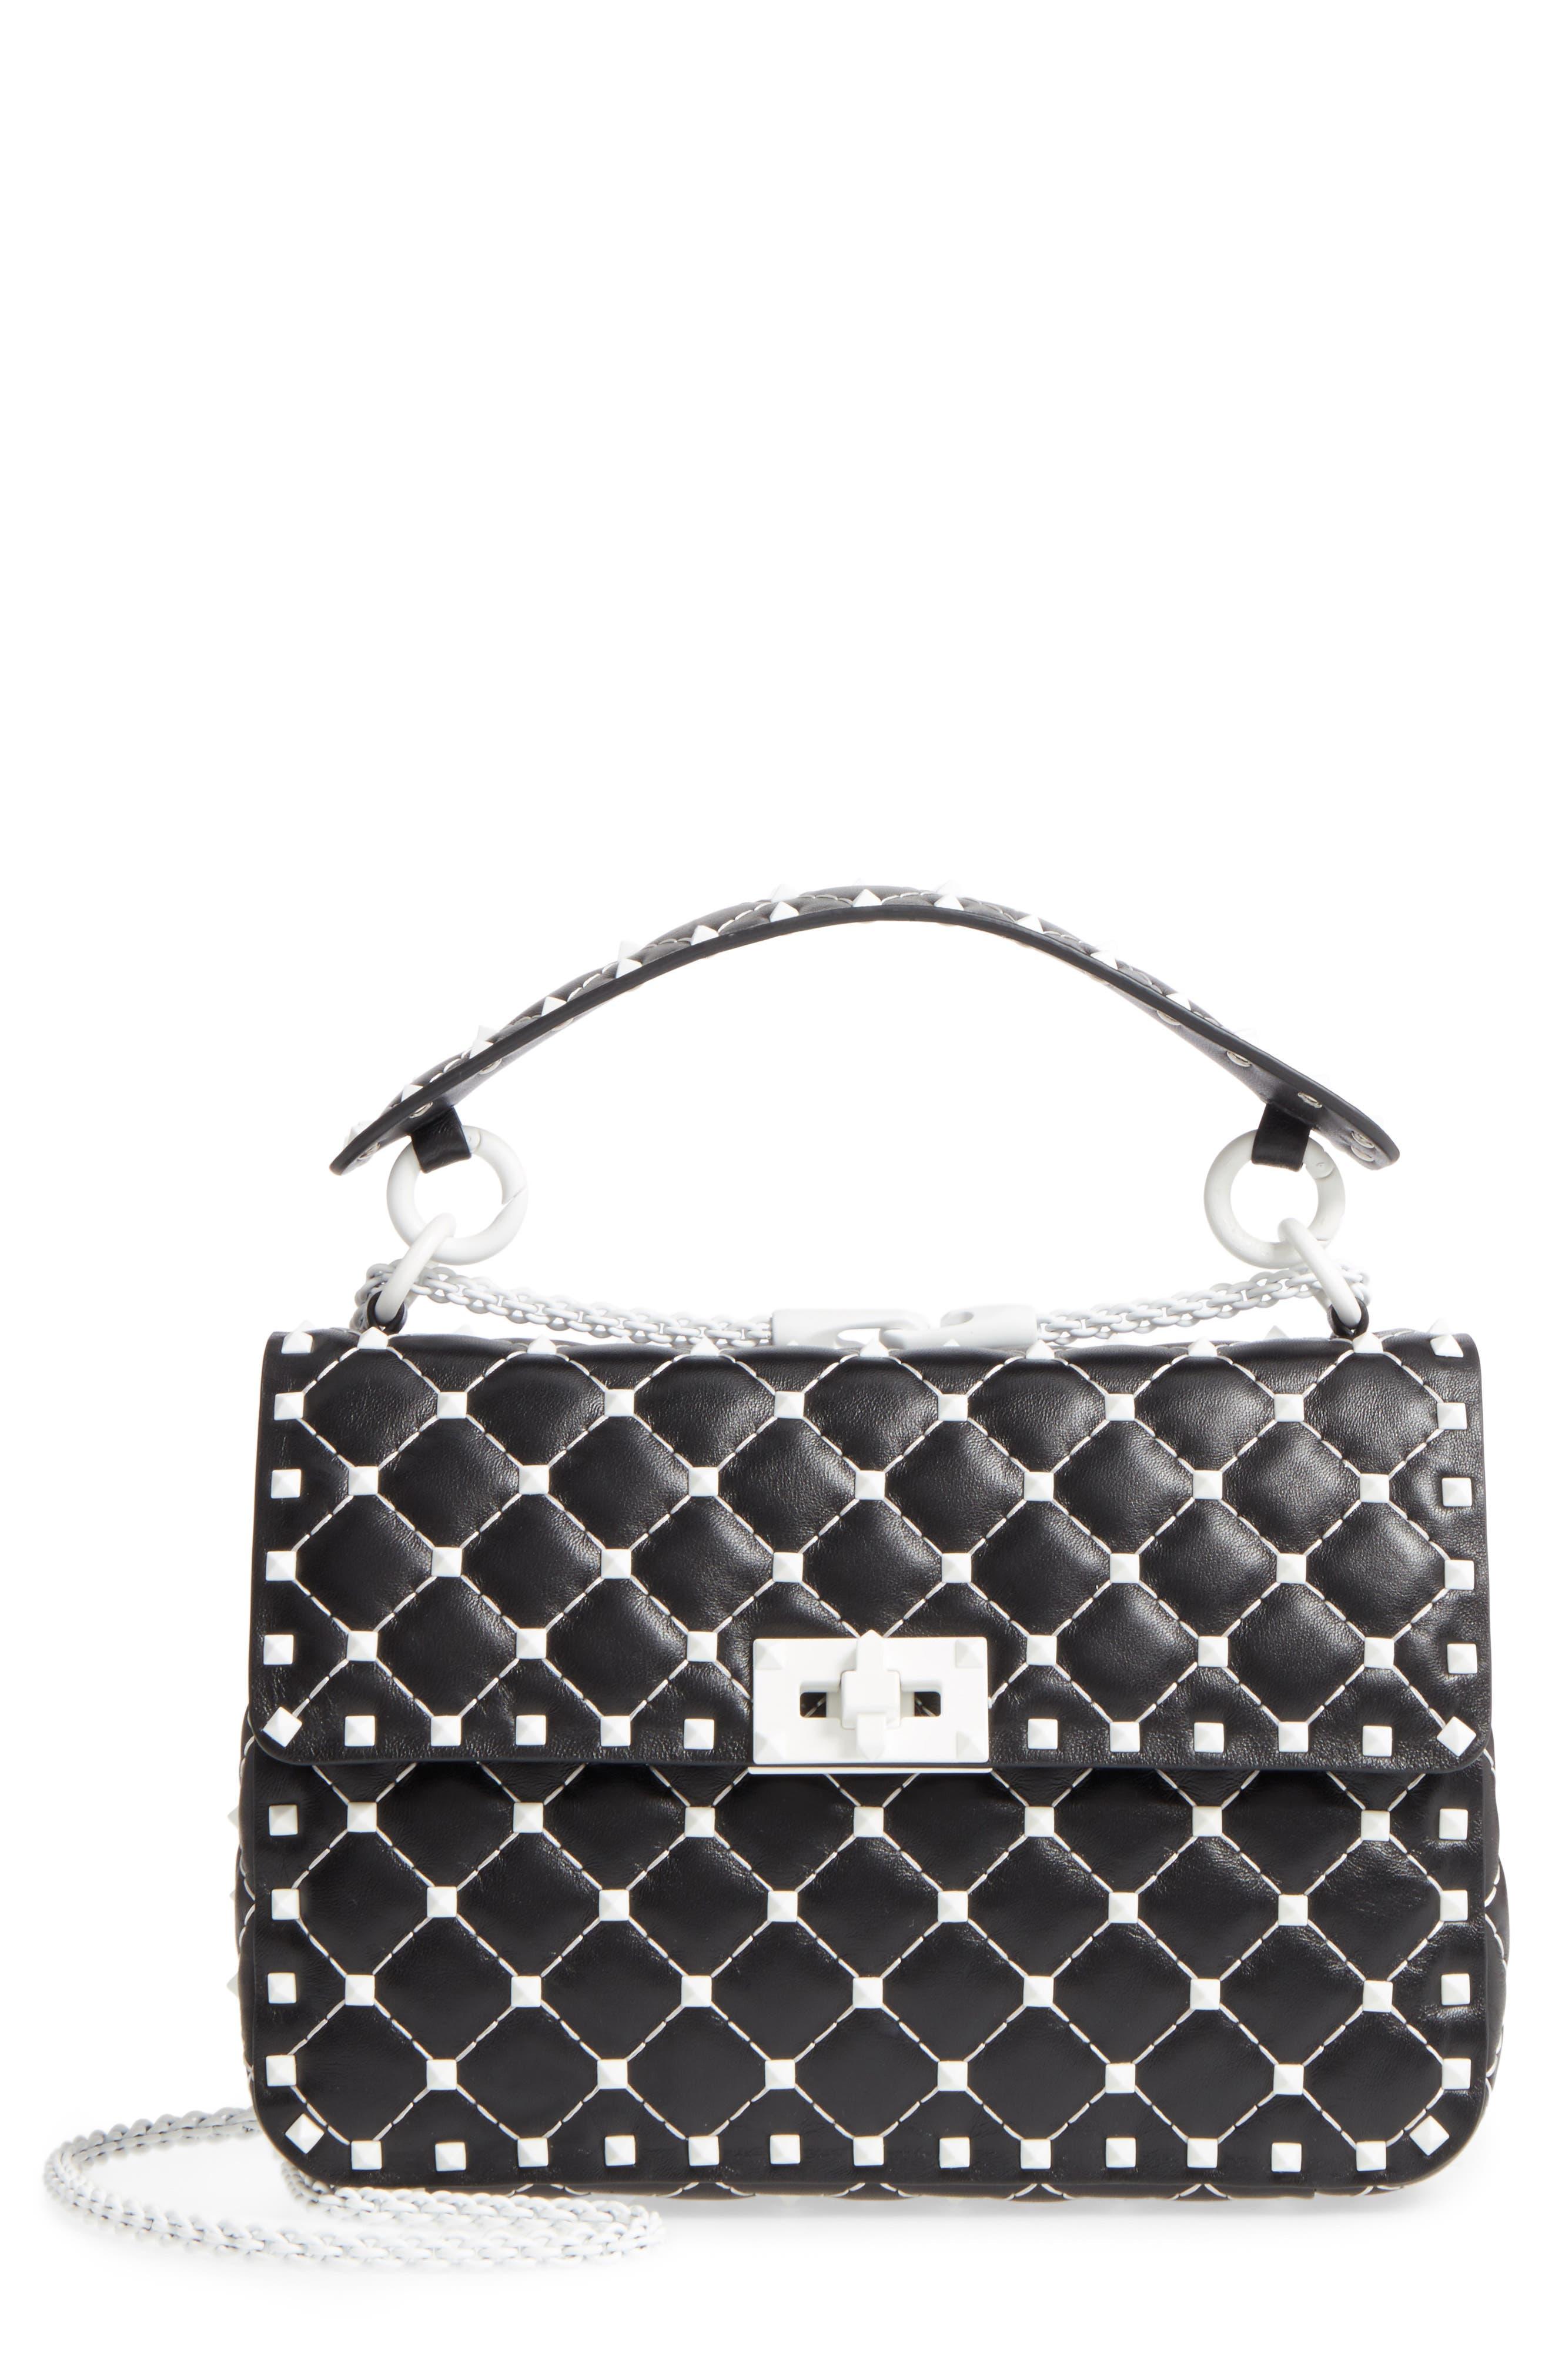 Medium Rockstud Matelassé Leather Shoulder Bag,                             Main thumbnail 1, color,